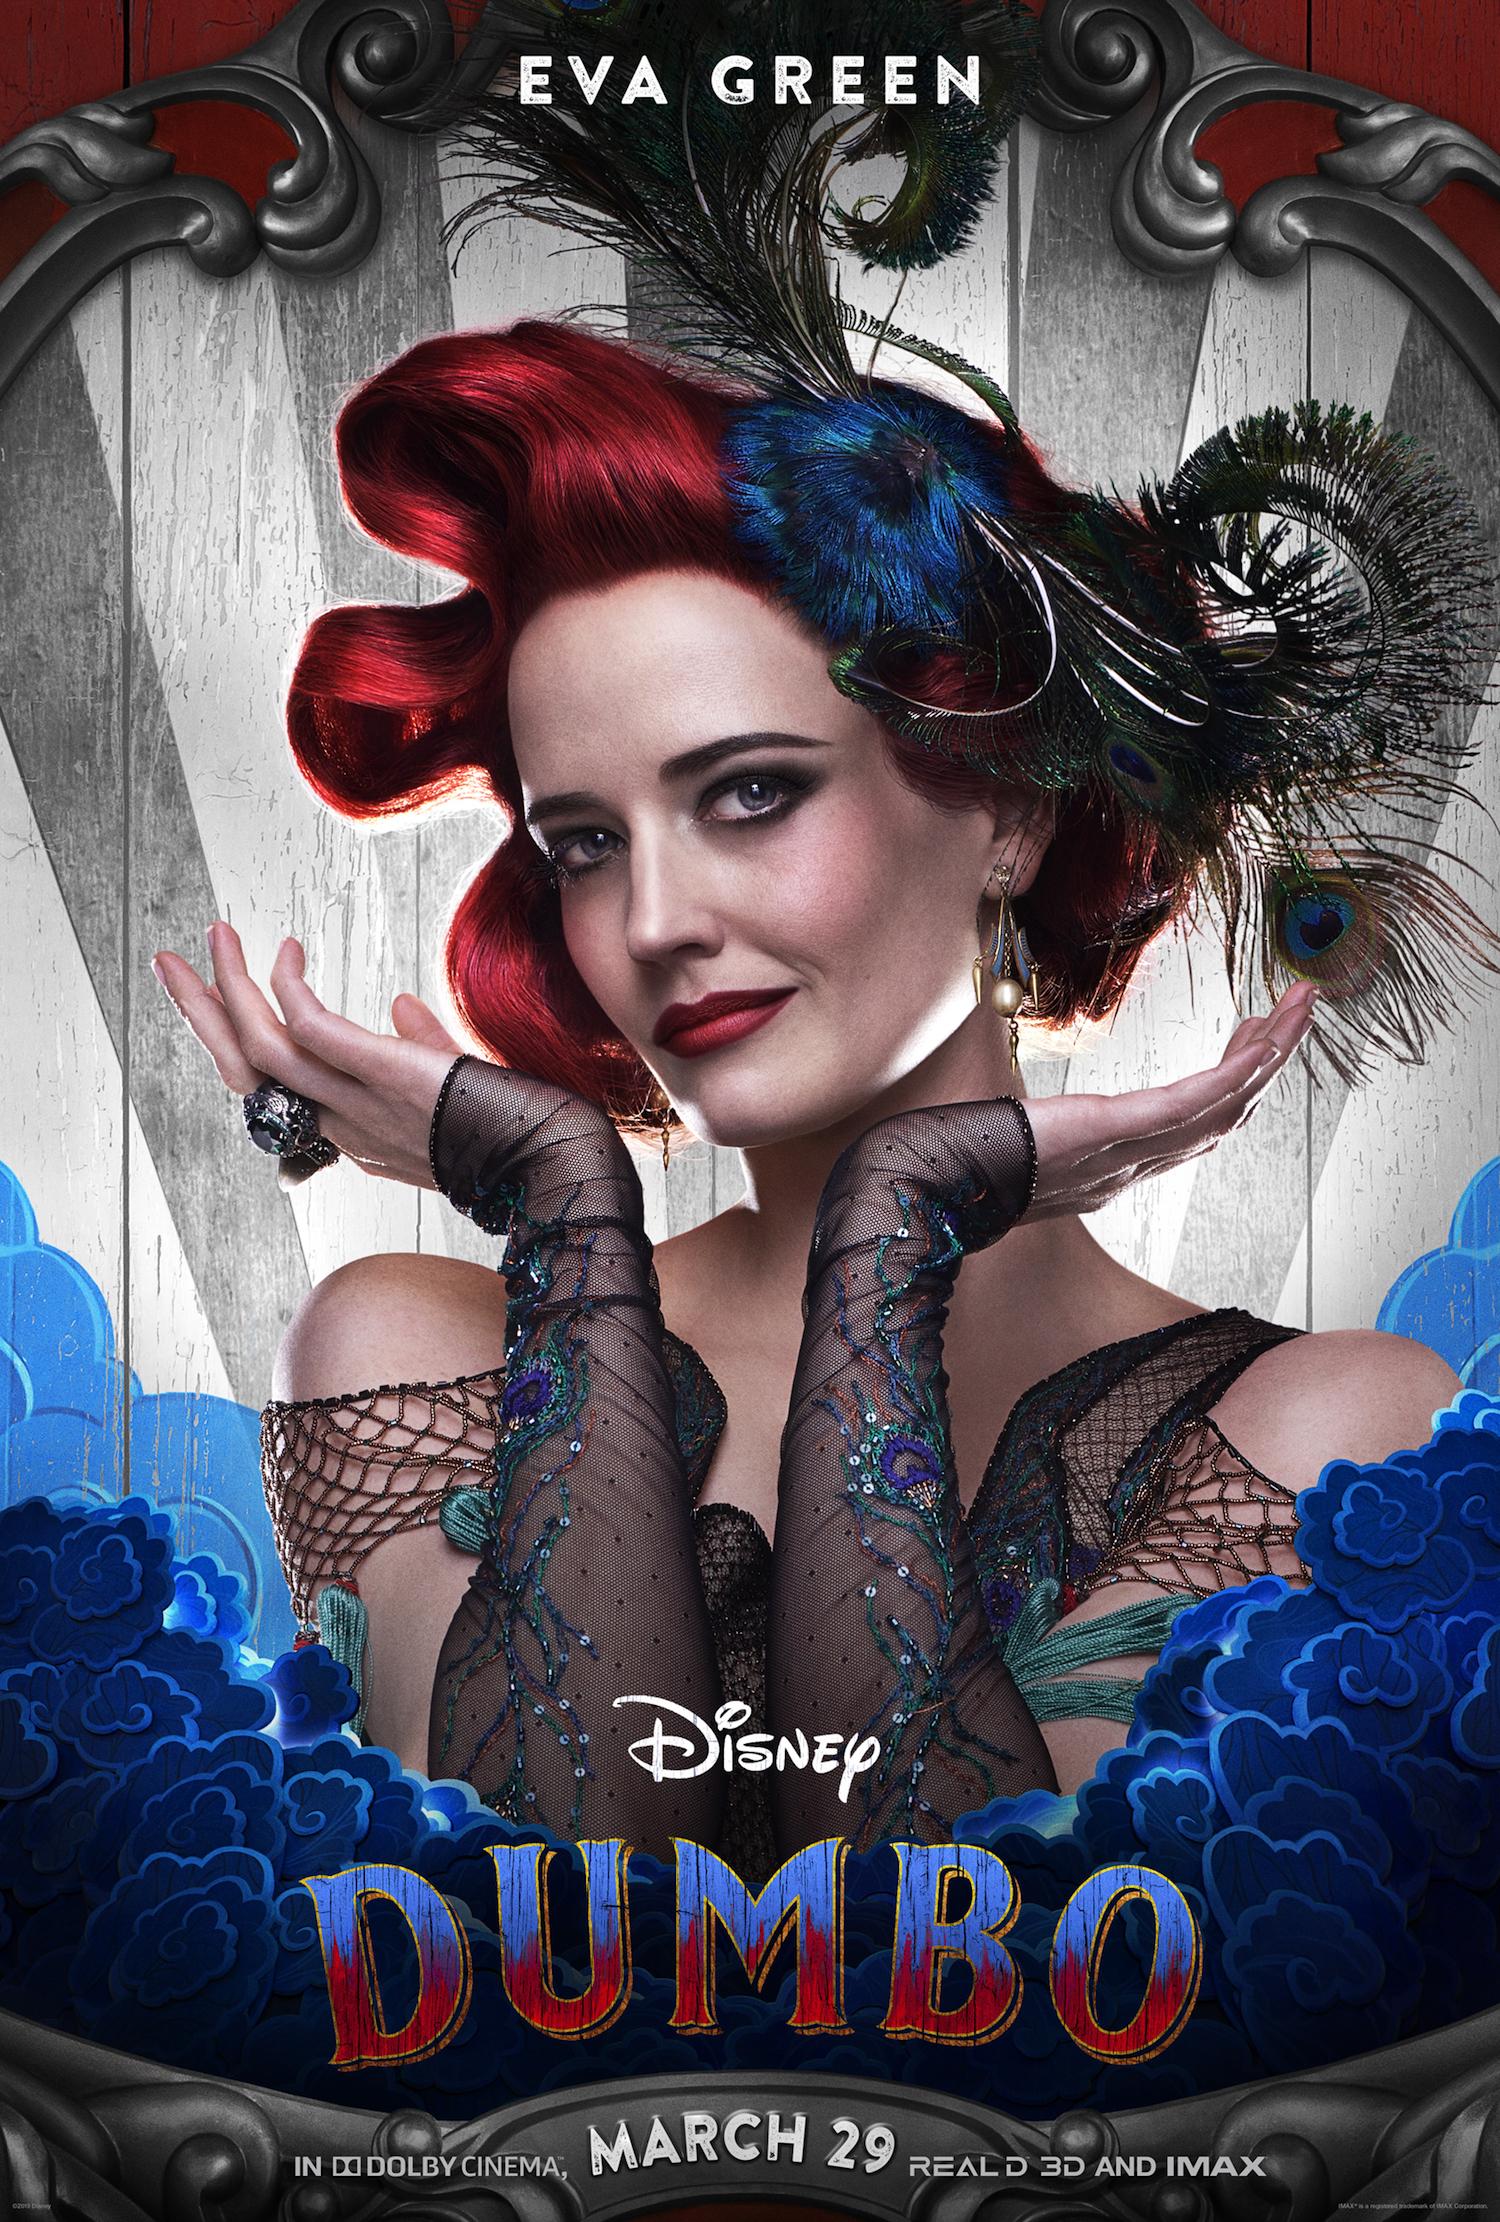 Eva Green stars in the new live action Disney Dumbo movie.